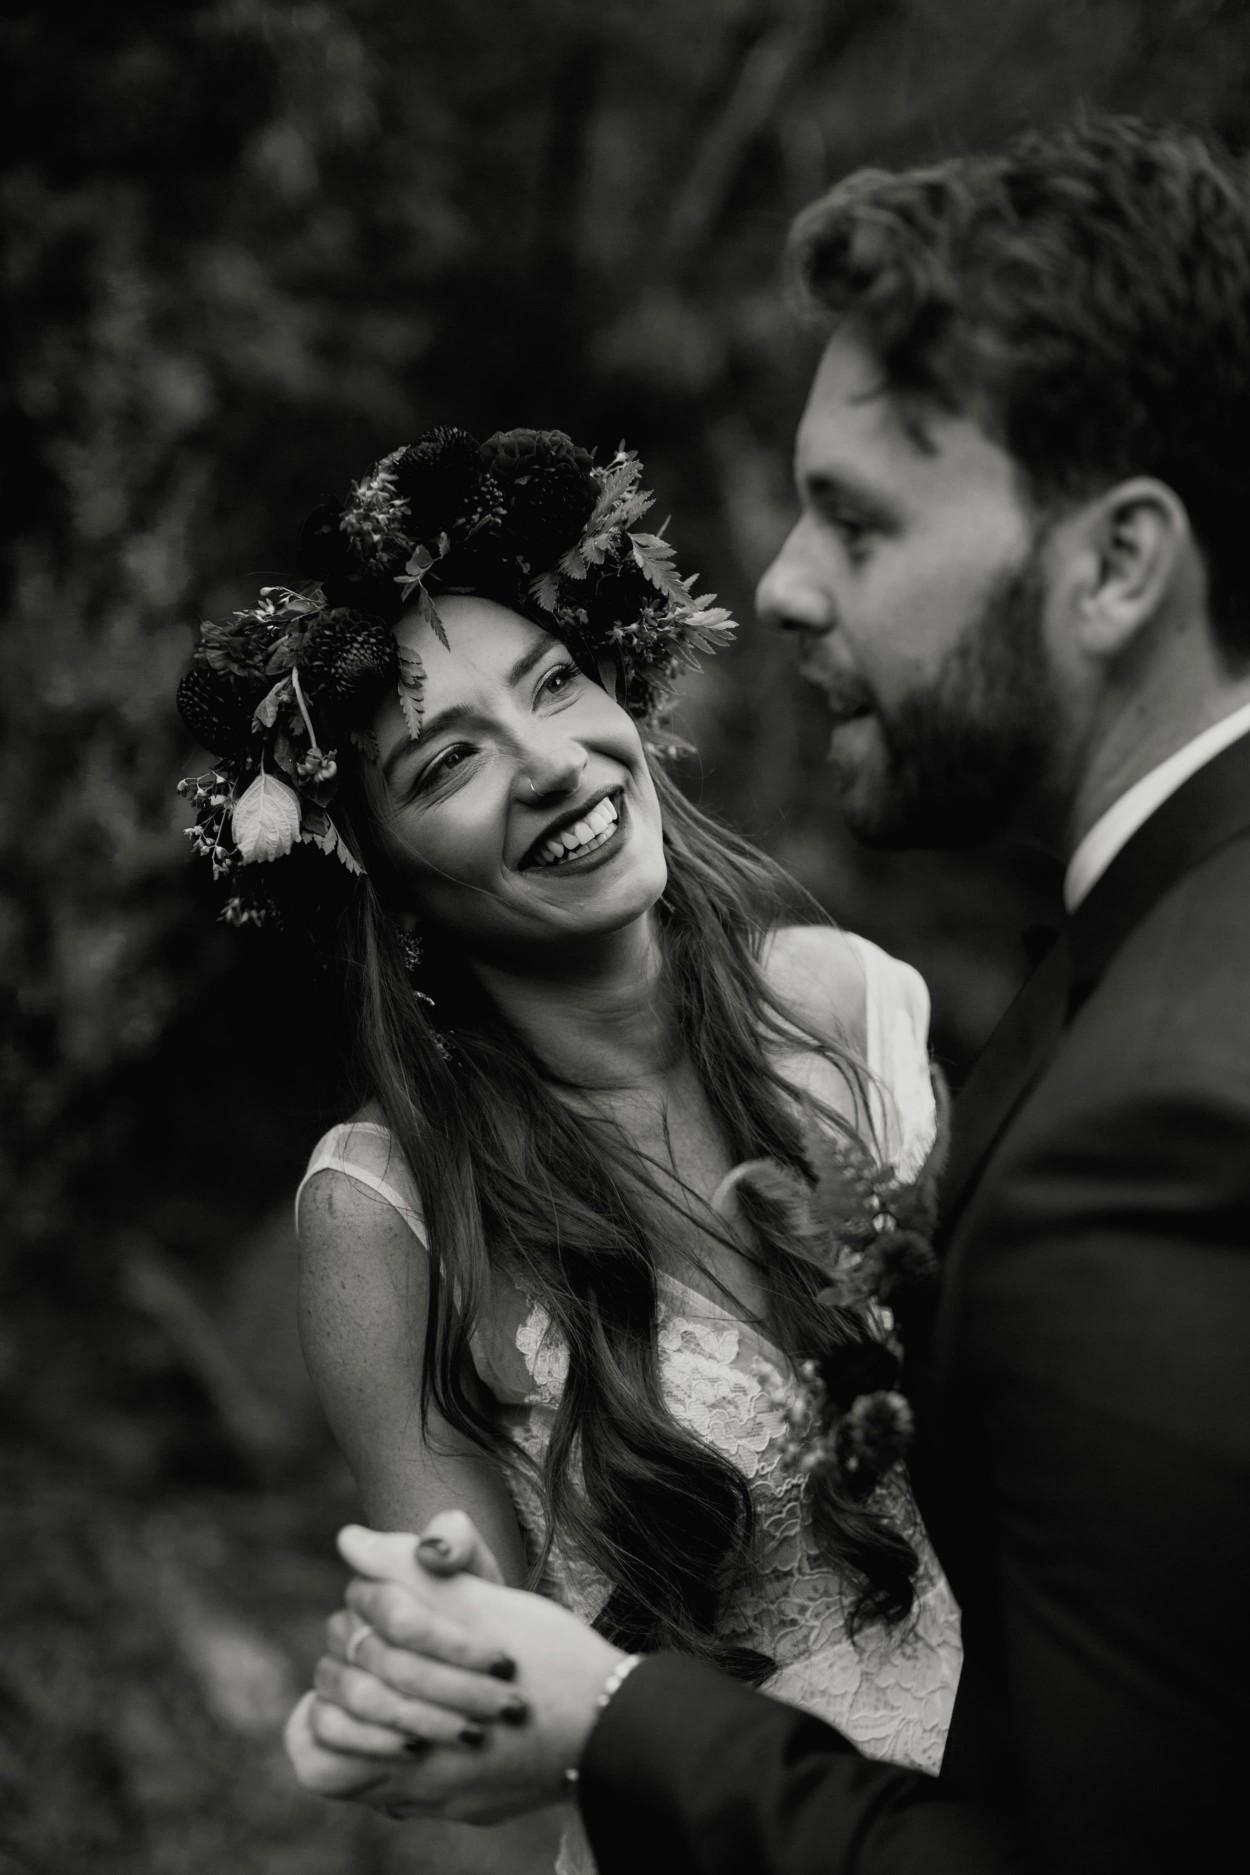 I-Got-You-Babe-&-Co.-Wedding-Photographers-Cassie007.jpg